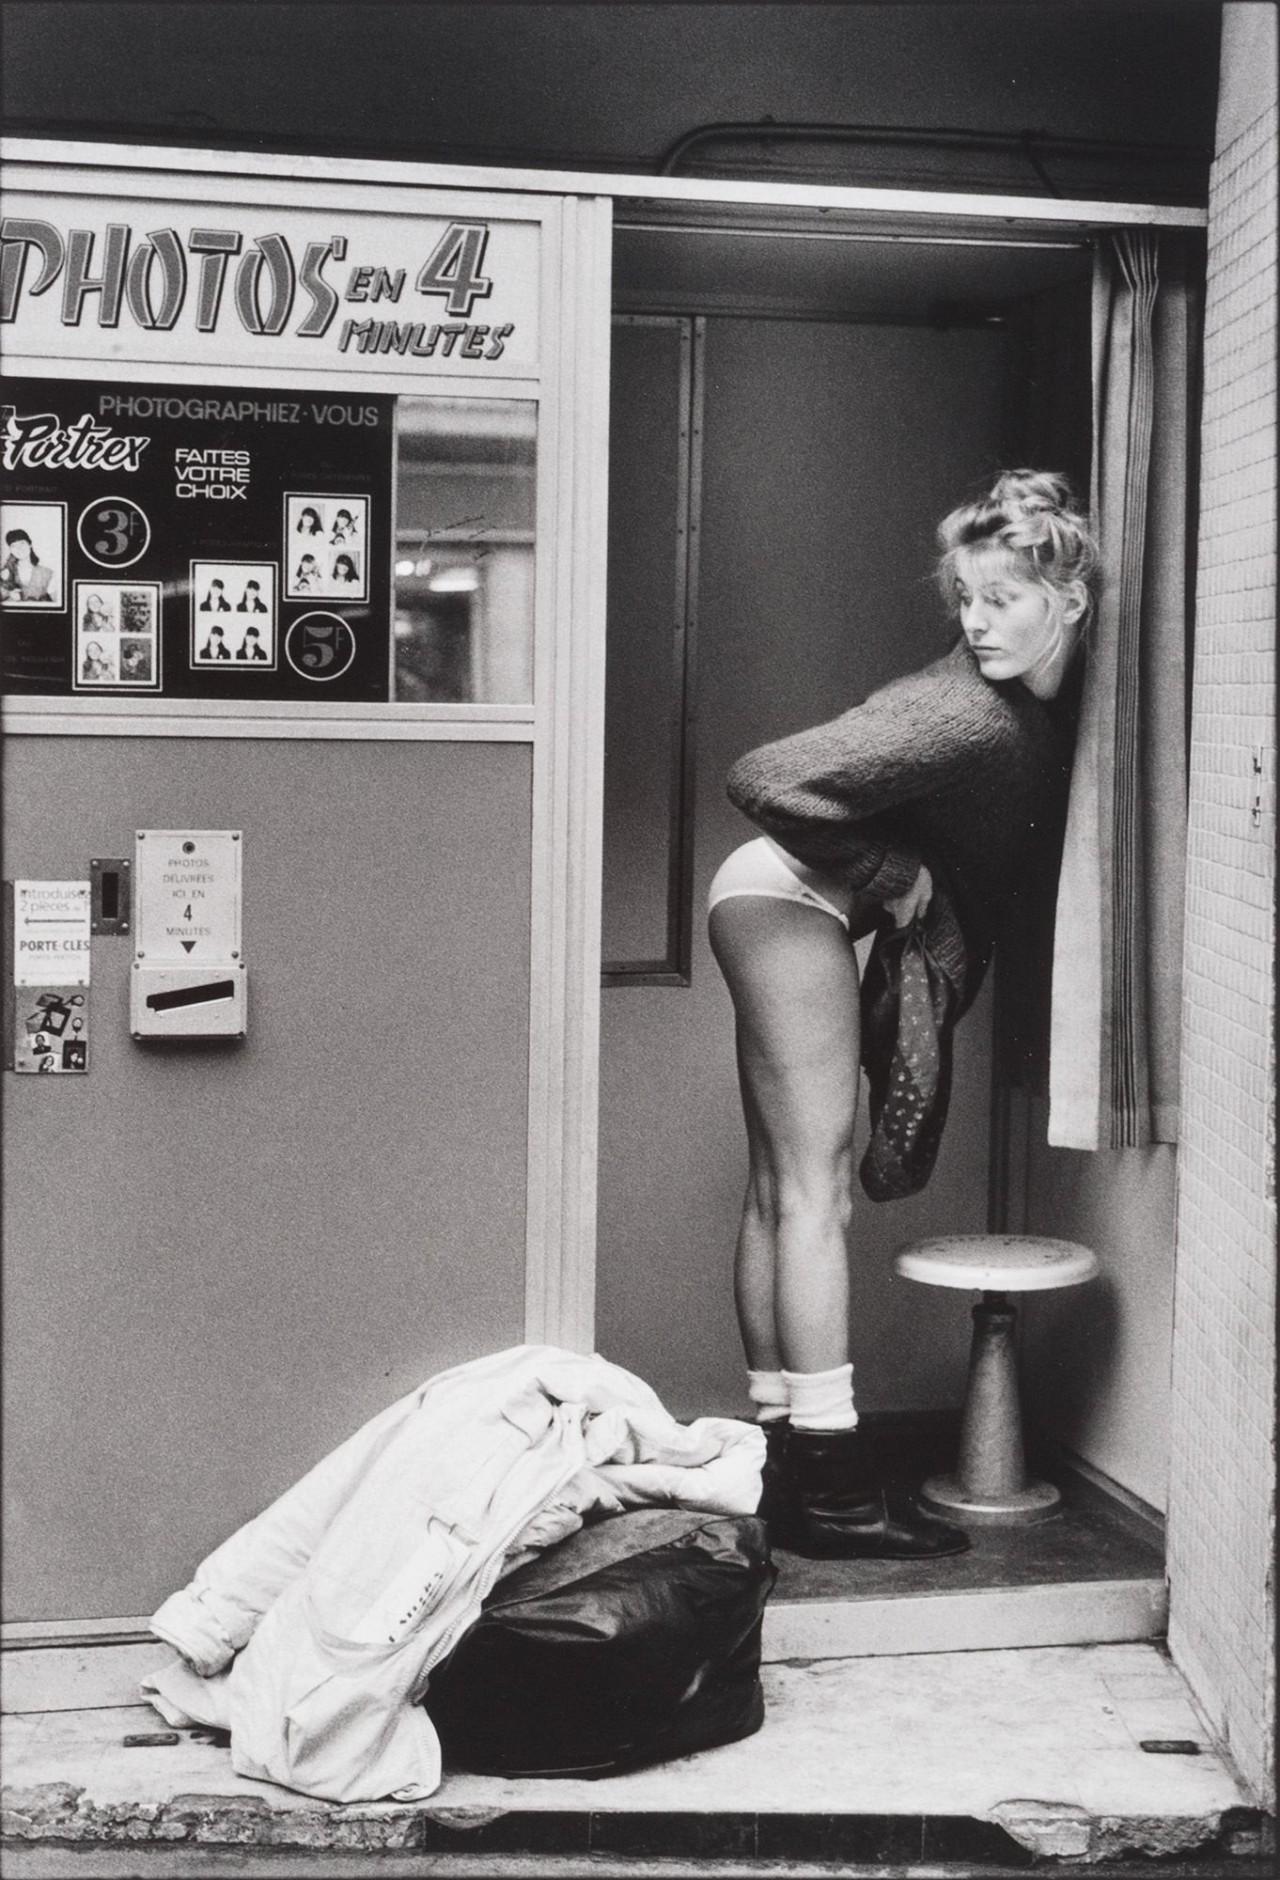 Фотокабина, 1980. Фотограф Жан-Франсуа Жонвиль